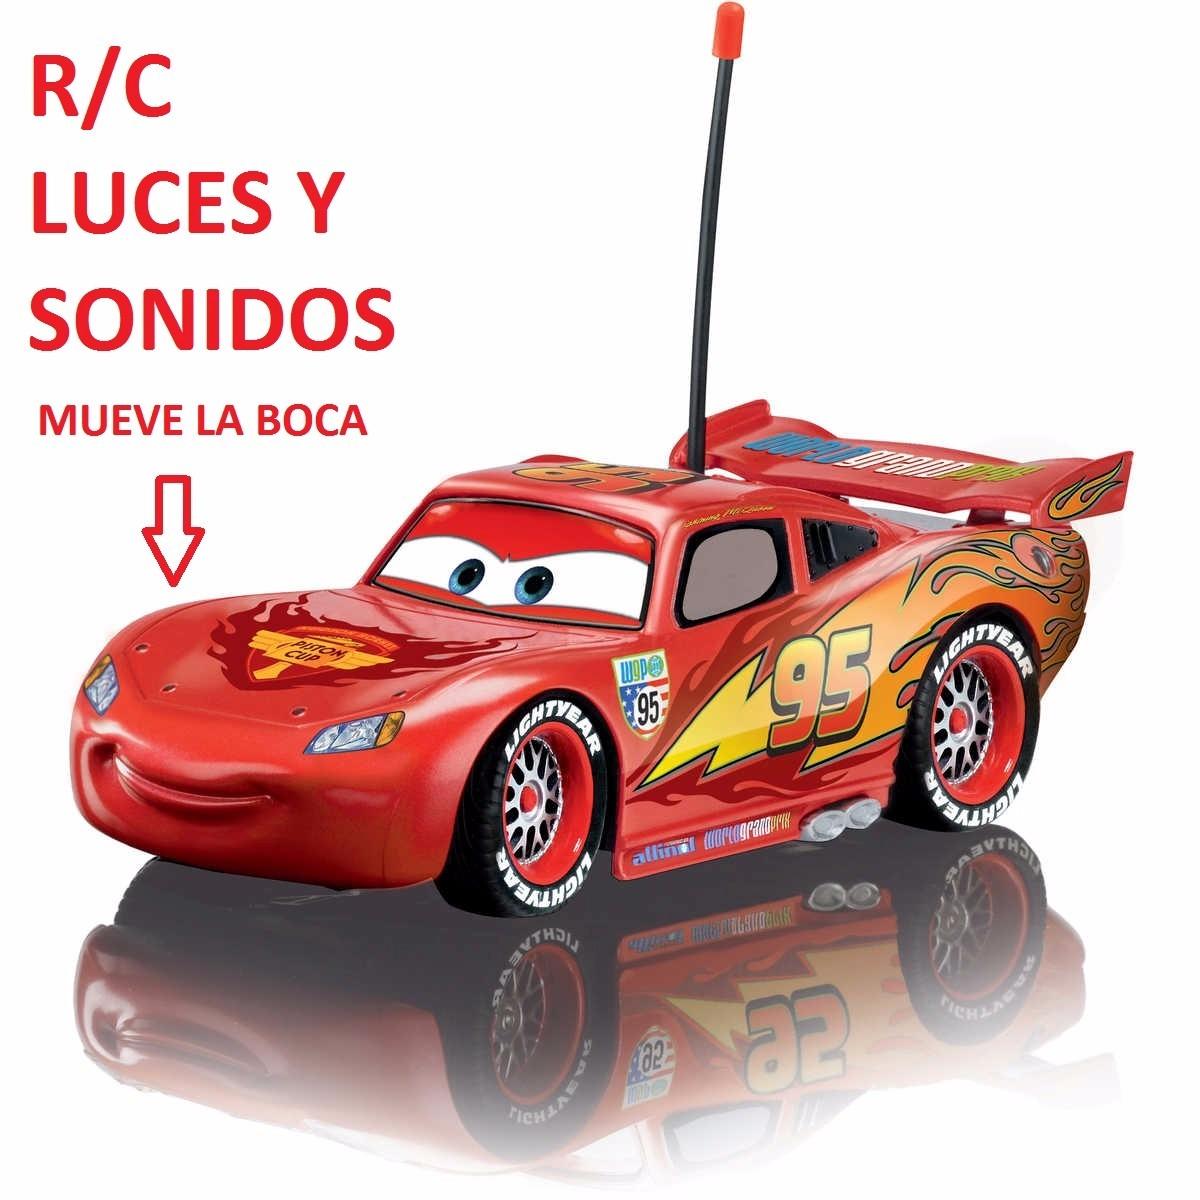 Carro Rayo Mcqueen Control Remoto R/c Mueve La Boca - $ 99